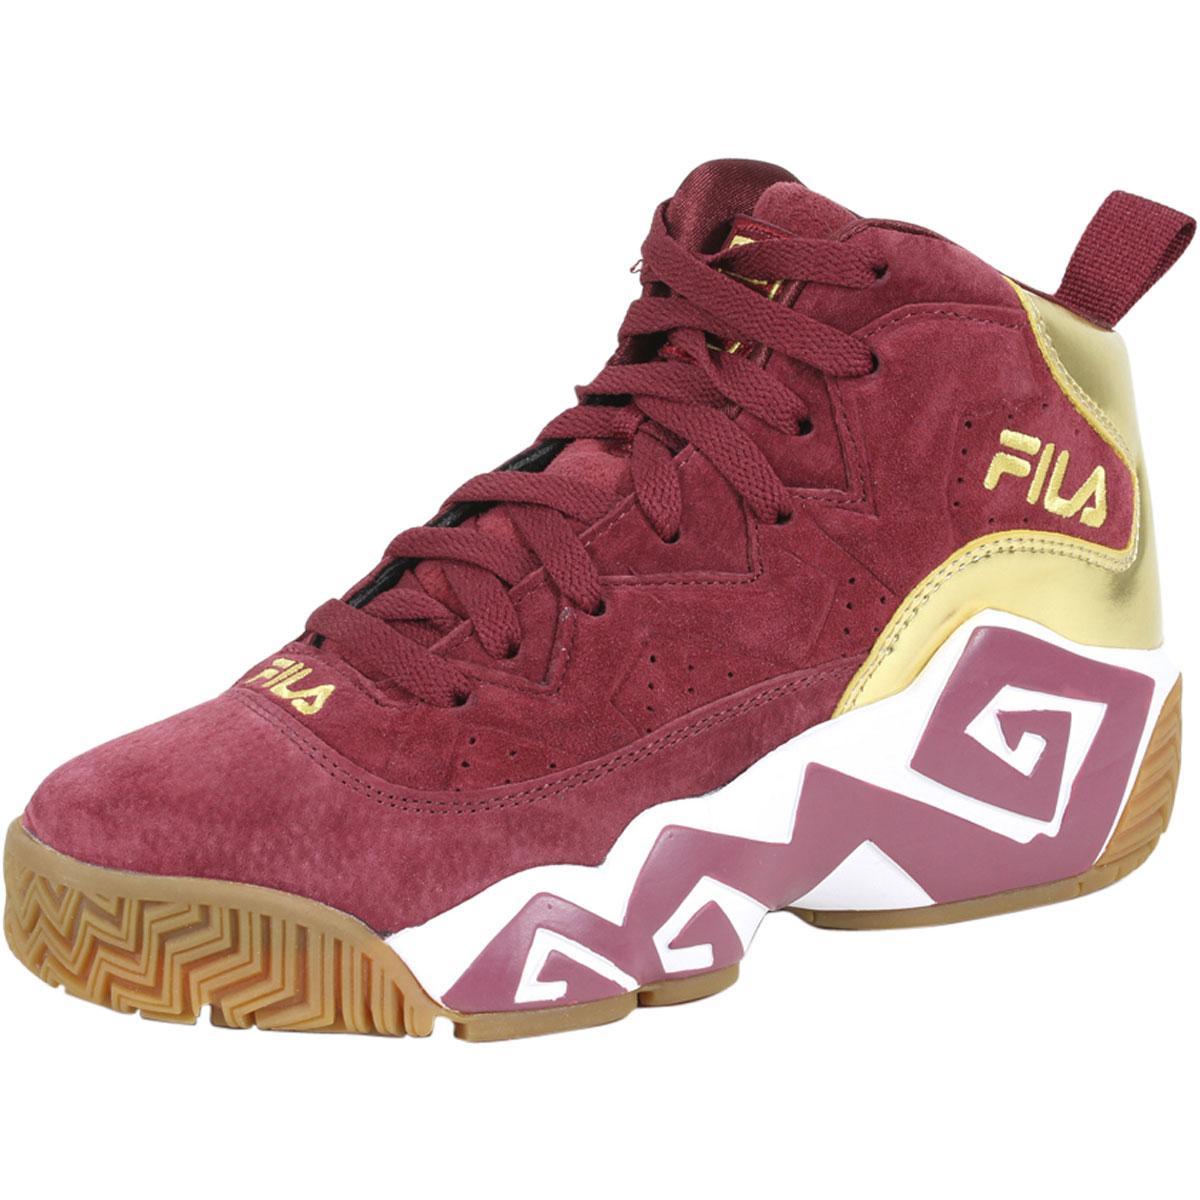 75c3d664b163 Fila Men s MB High-Top Sneakers Shoes